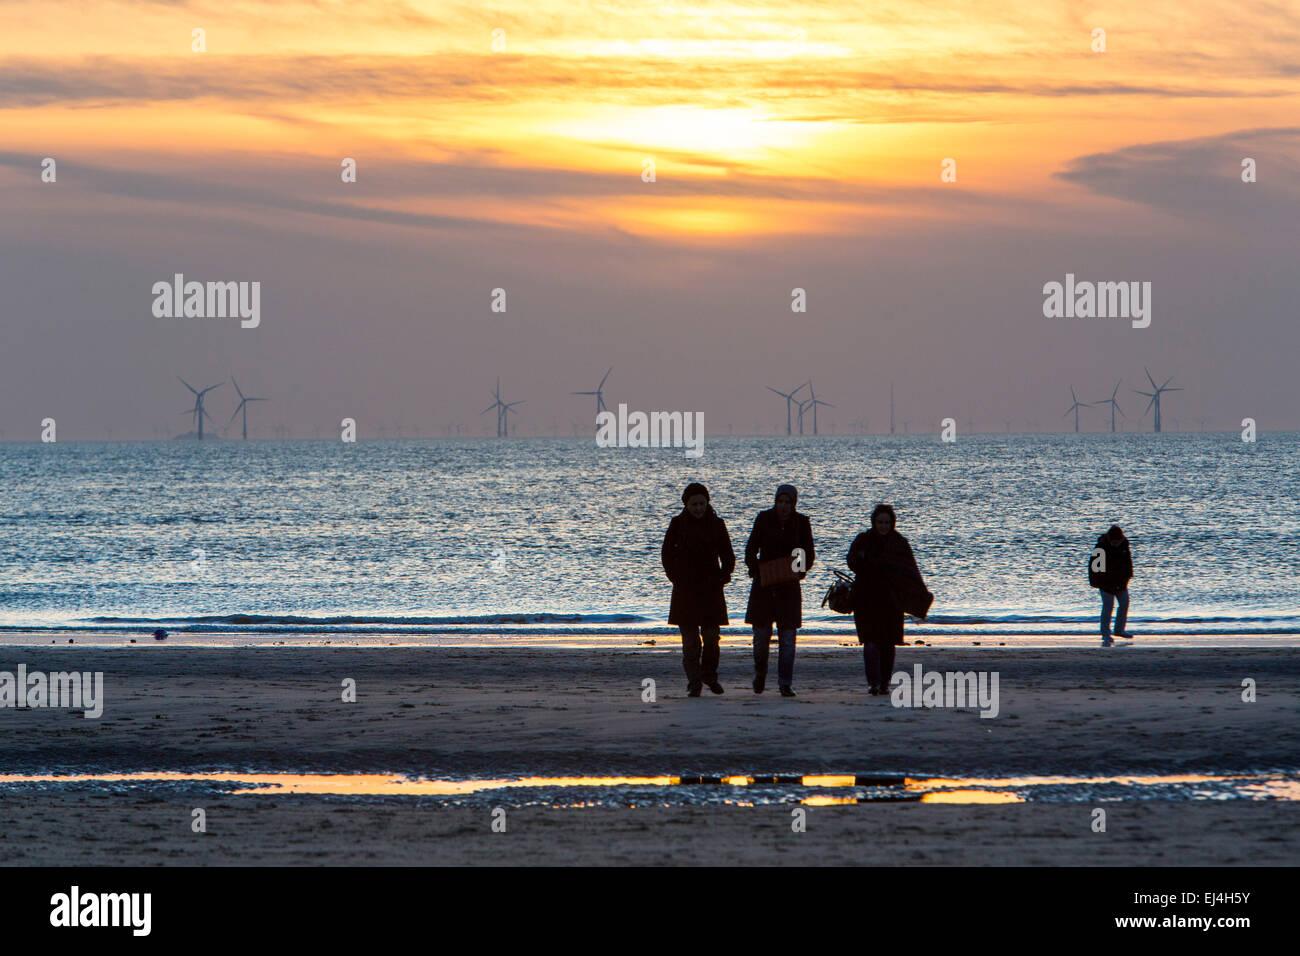 Egmond aan Zee, Holanda Septentrional, Holanda, costa del Mar del Norte, playas de arena blanca. Imagen De Stock